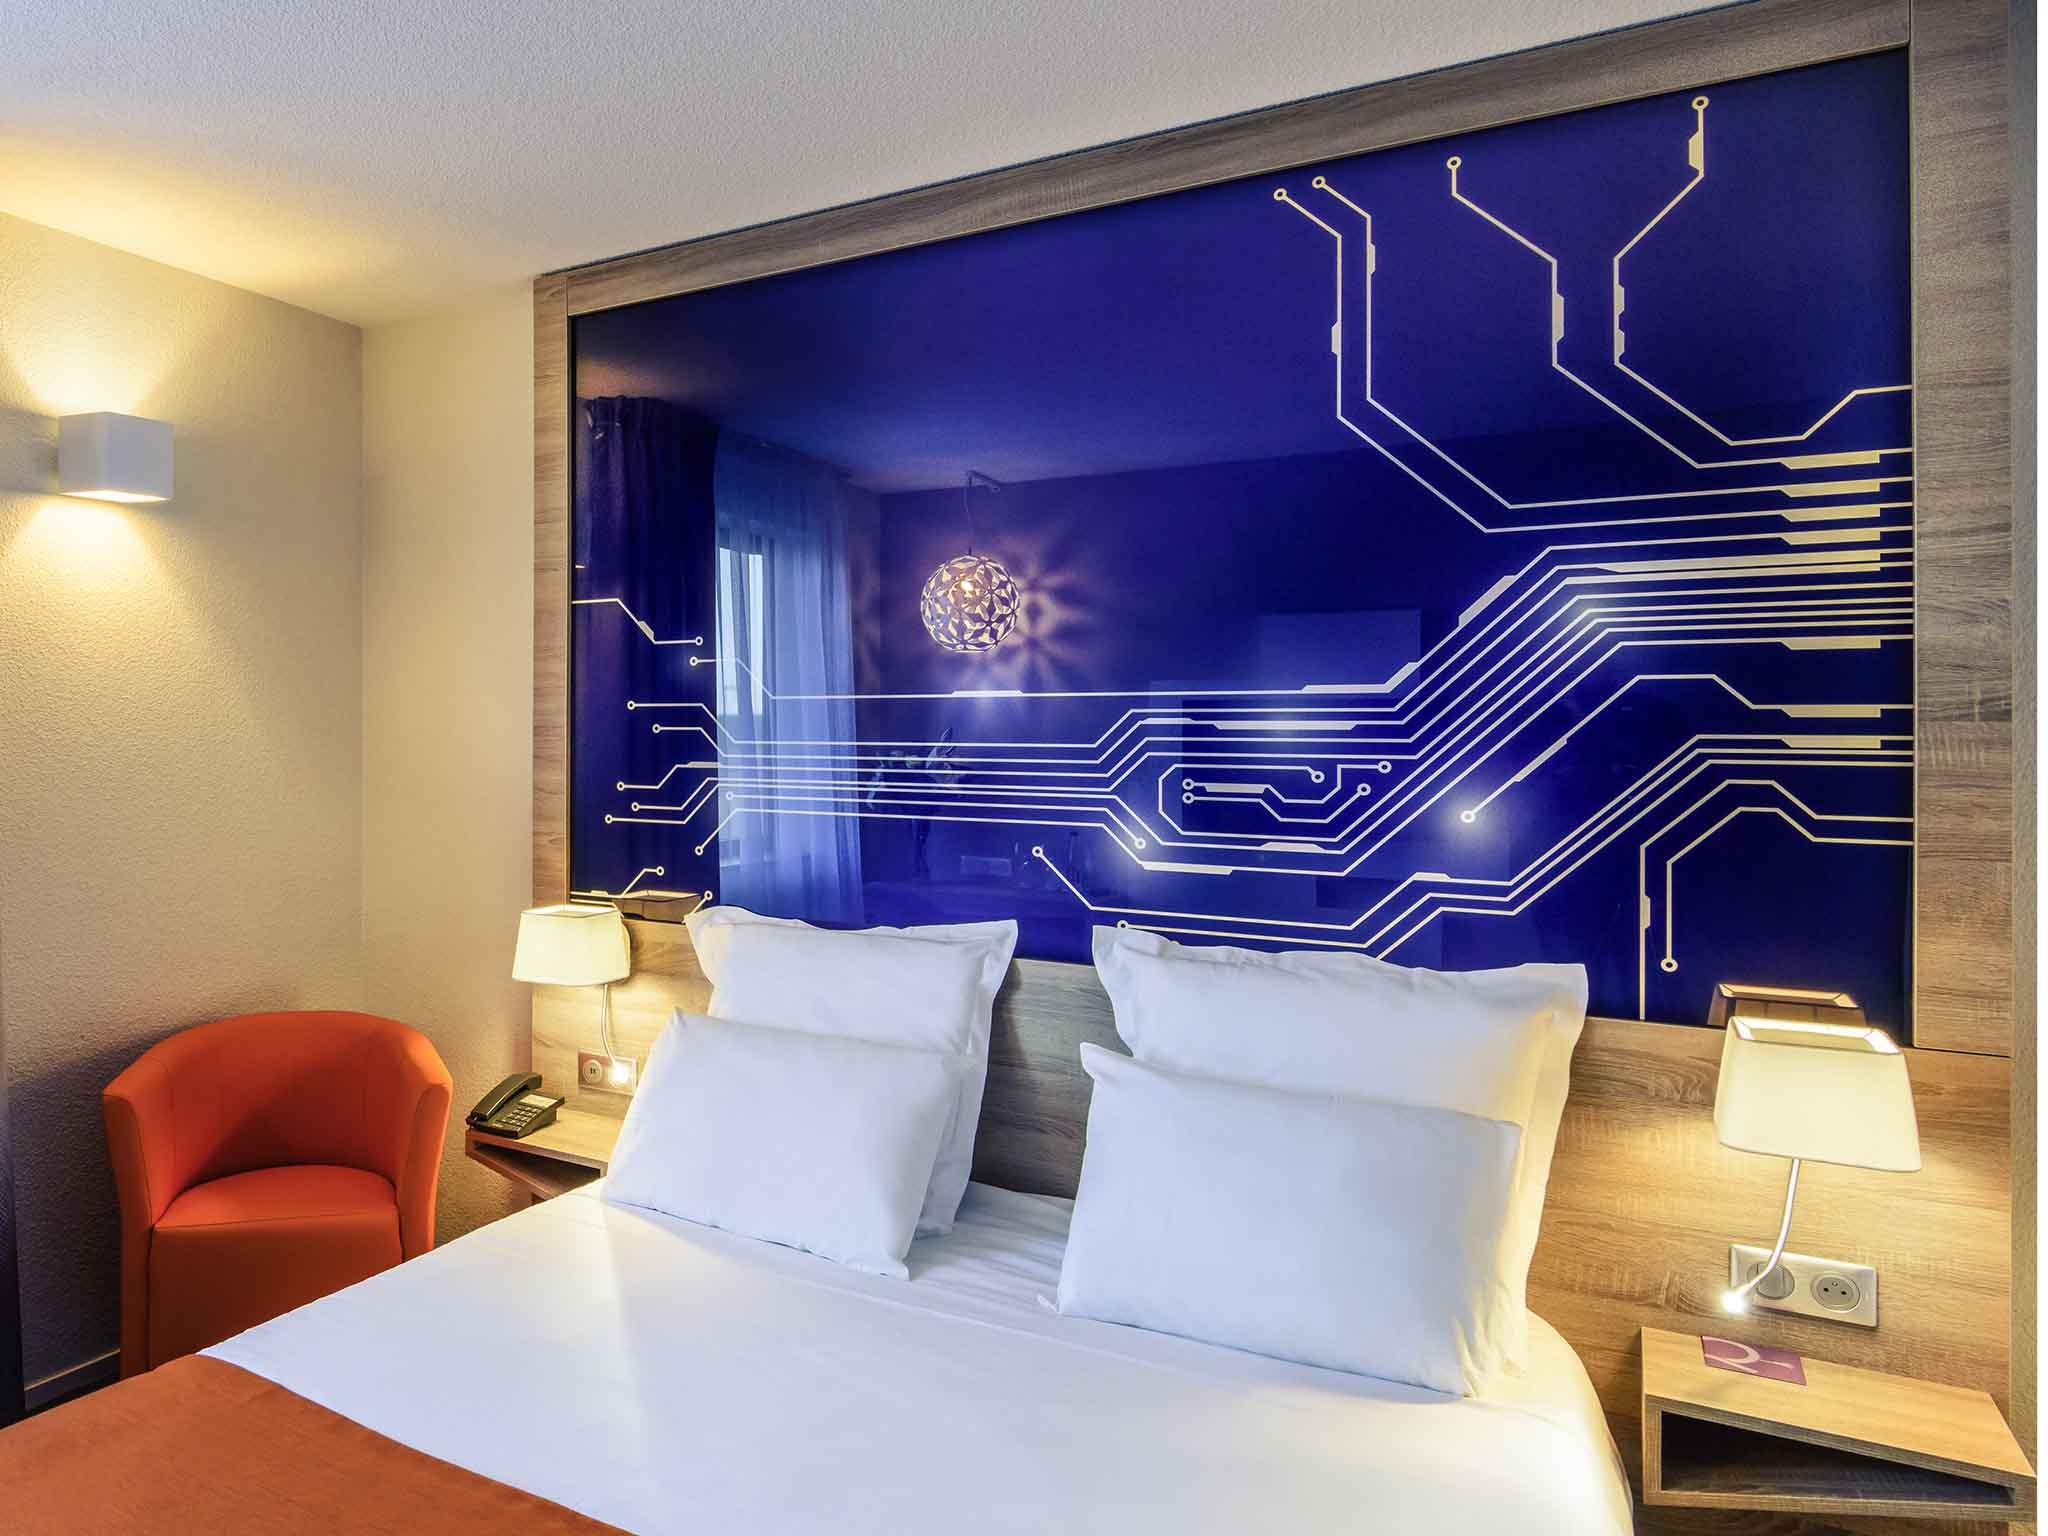 Hotel – Hotel Mercure Poitiers Site du Futuroscope